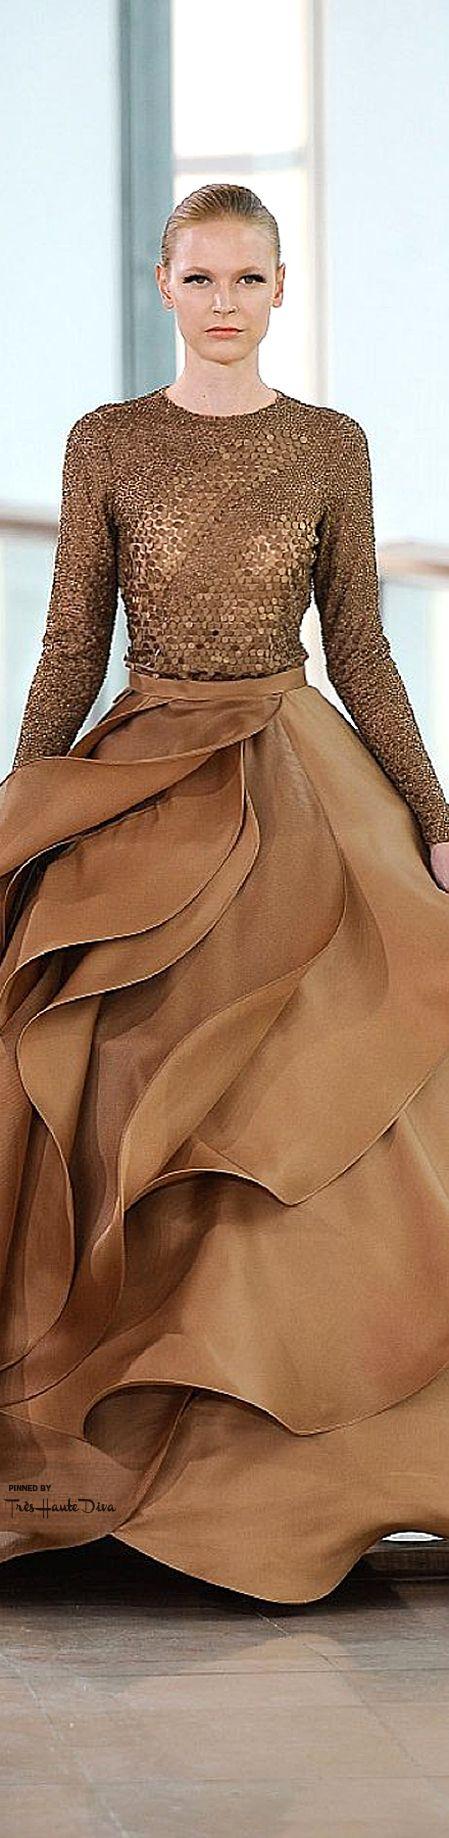 Stephane Rolland Spring 2015 Couture ♔THD♔ Handmade Handbags & Accessories - amzn.to/2ij5DXx Handmade Handbags & Accessories - amzn.to/2iLR27v More Clothing, Shoes & Jewelry - Women - handmade handbags & accessories - http://amzn.to/2kdX3h7